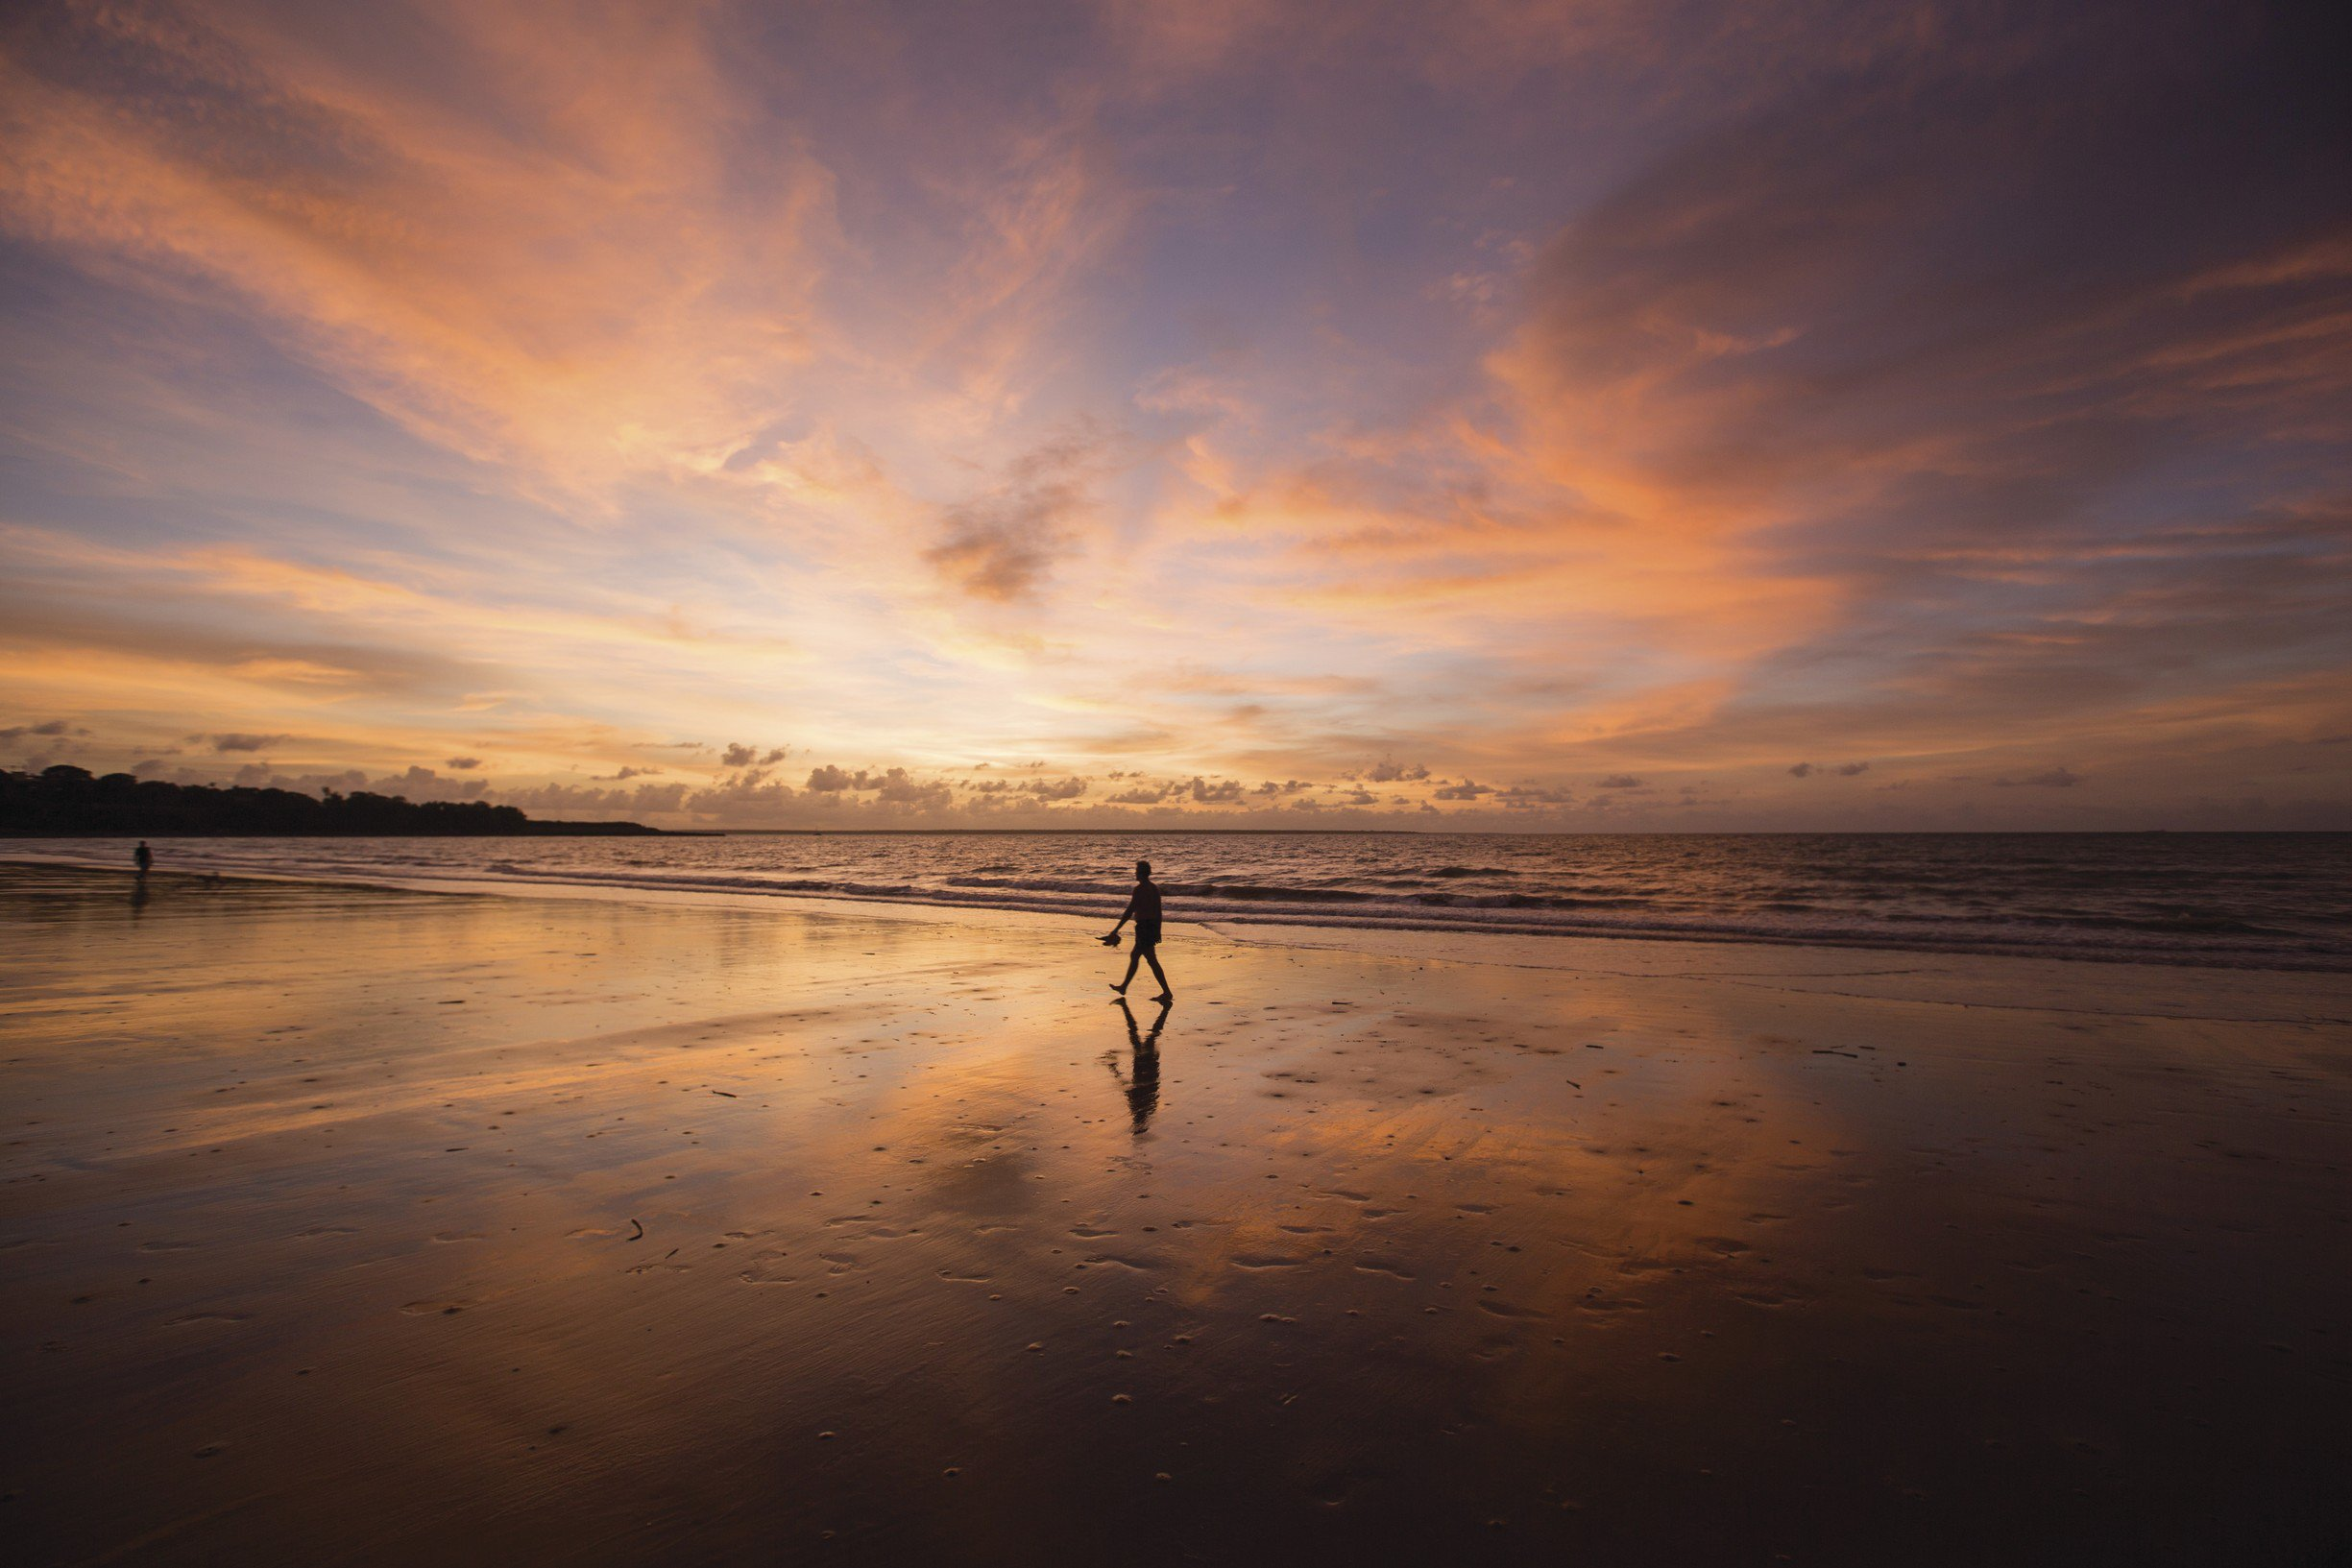 Sonnenuntergang am Mindil Beach Markt in Darwin